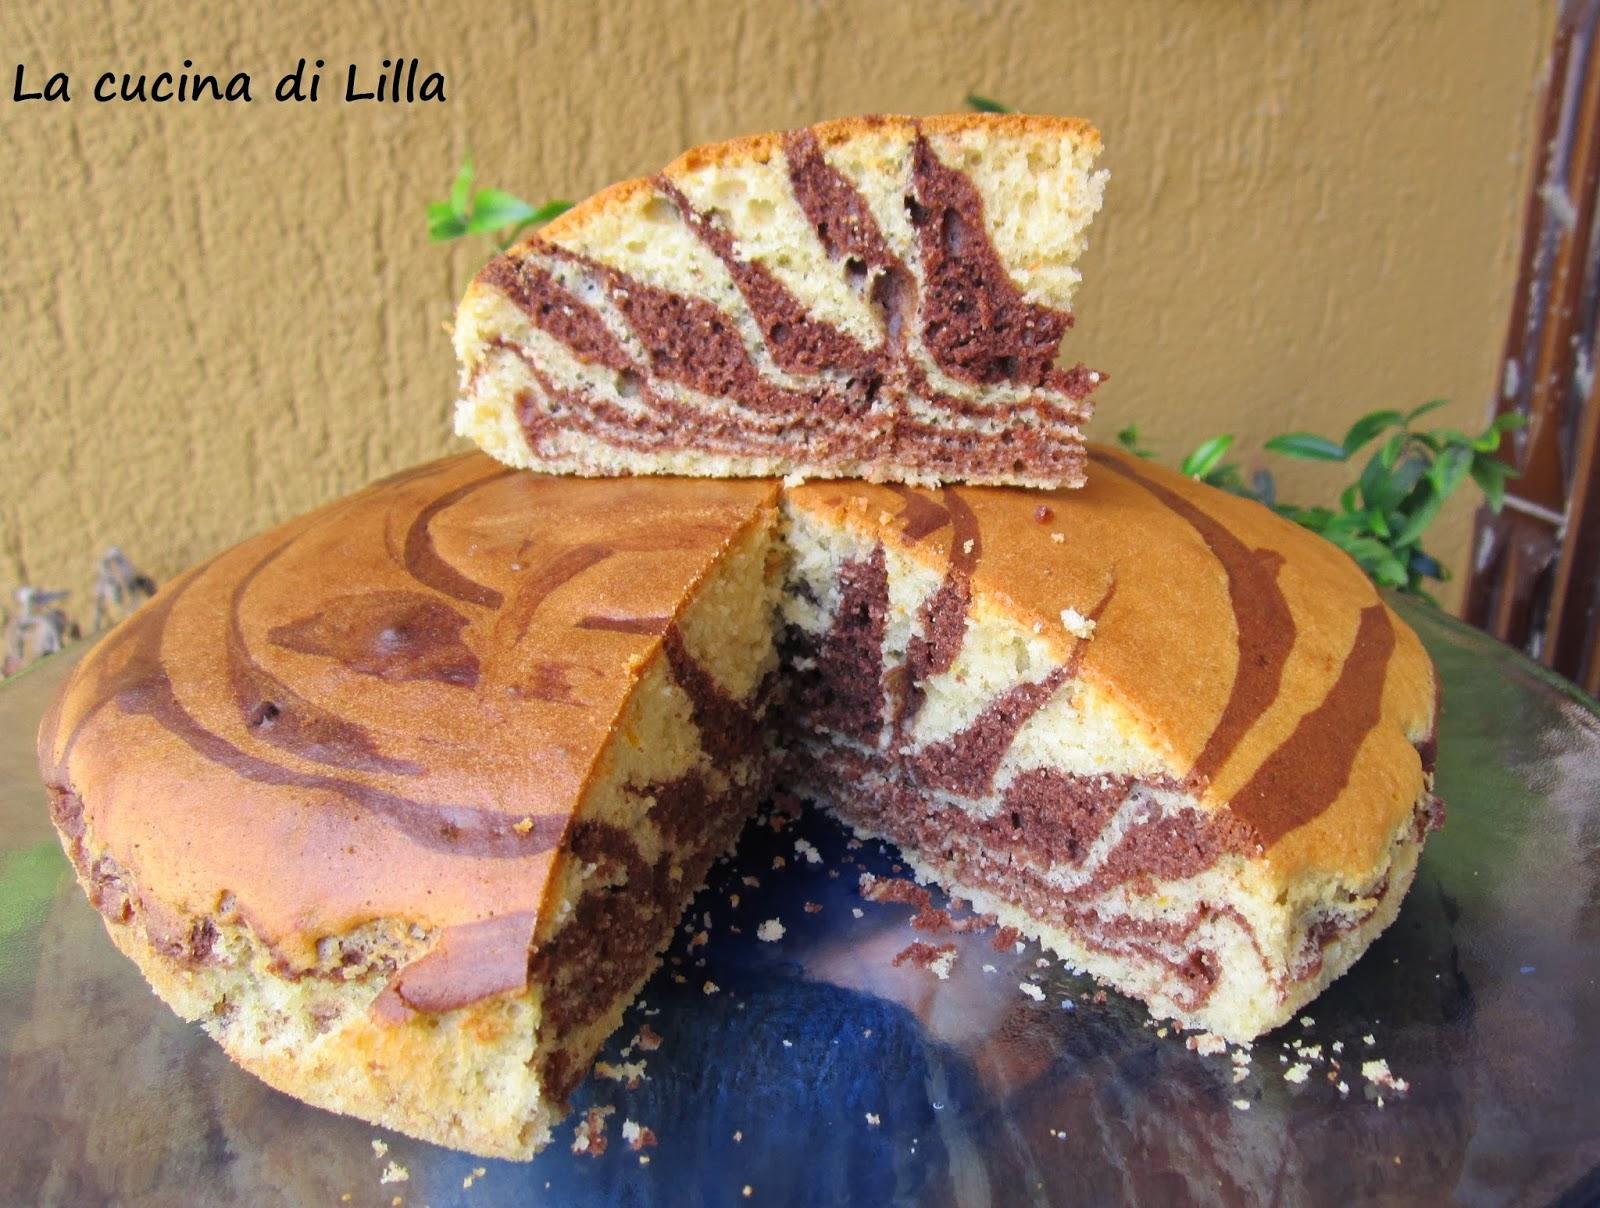 La cucina di lilla torte - La cucina di sara torte ...